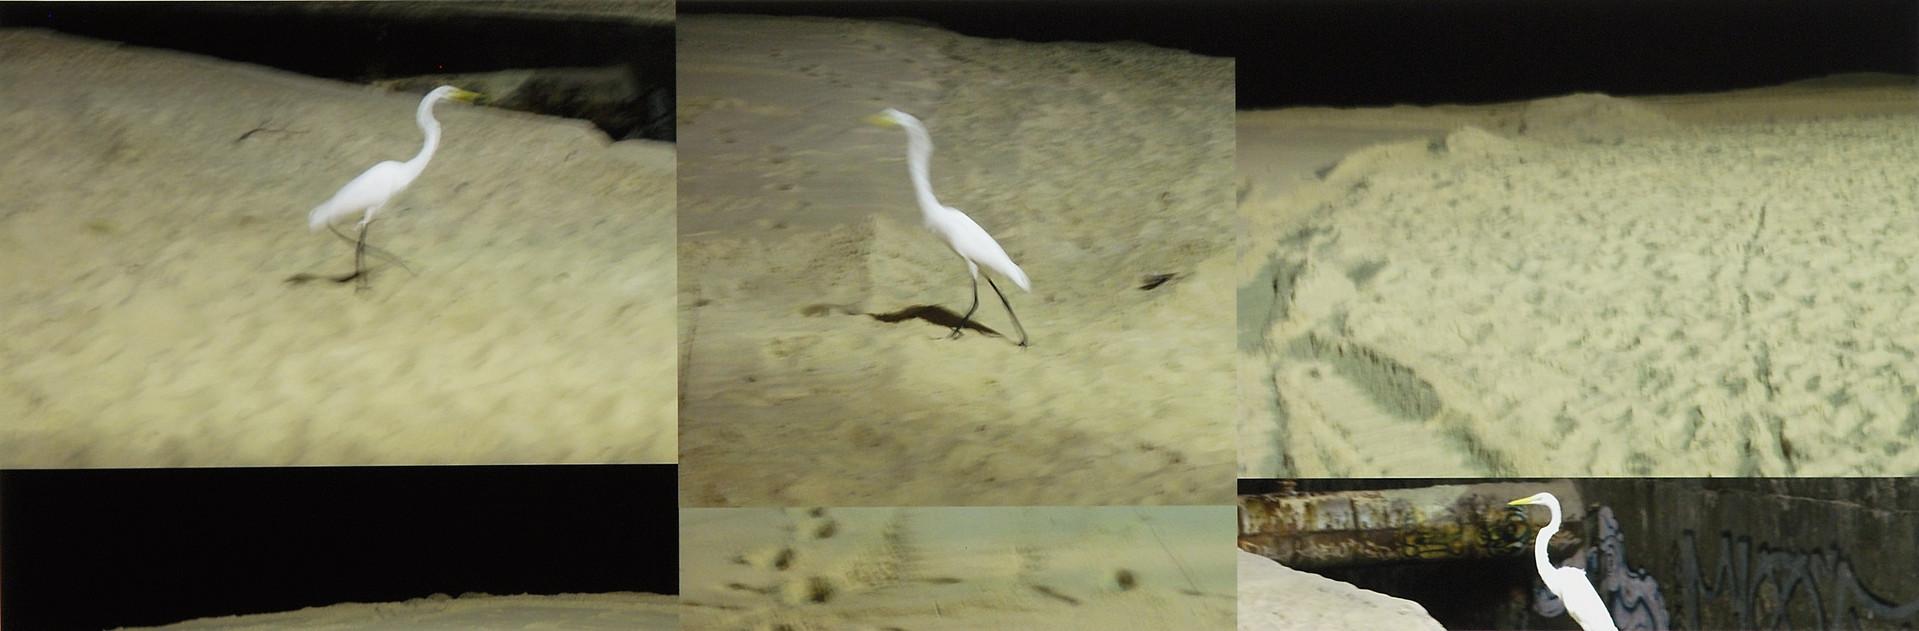 Sandscape, 2006